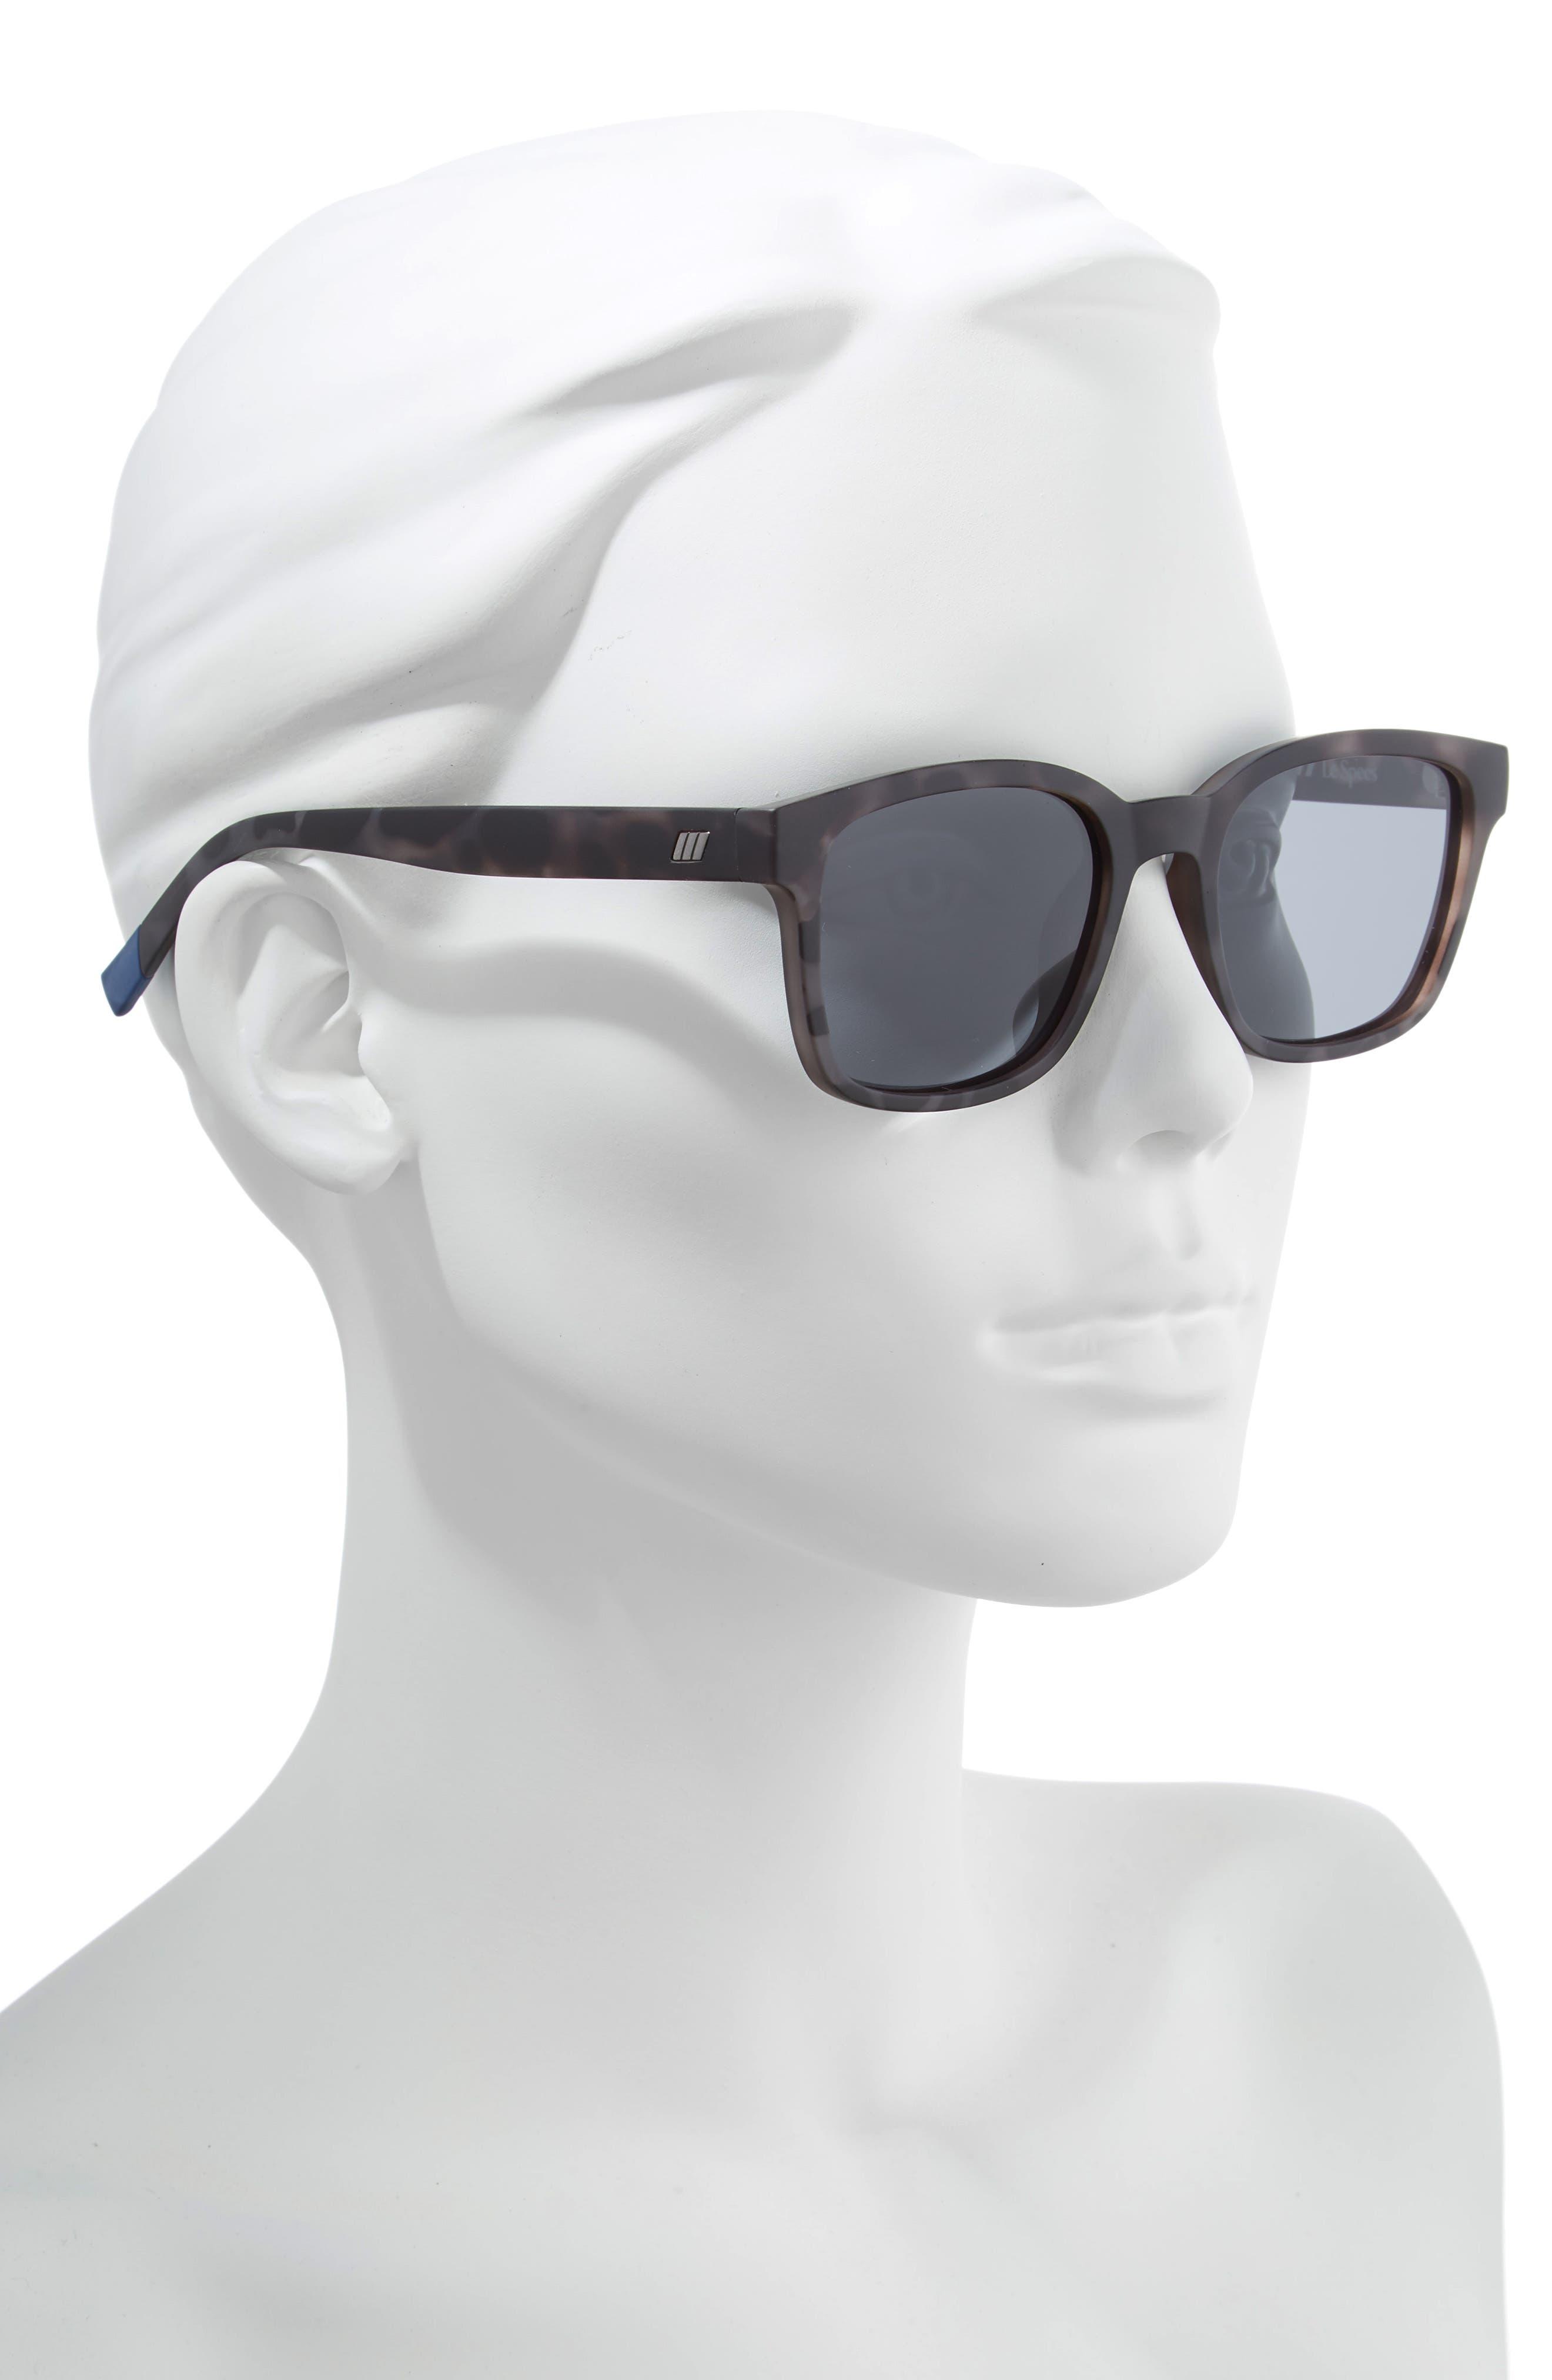 Alpha Basic 53mm Polarized Rectangular Sunglasses,                             Alternate thumbnail 2, color,                             MATTE COAL TORT